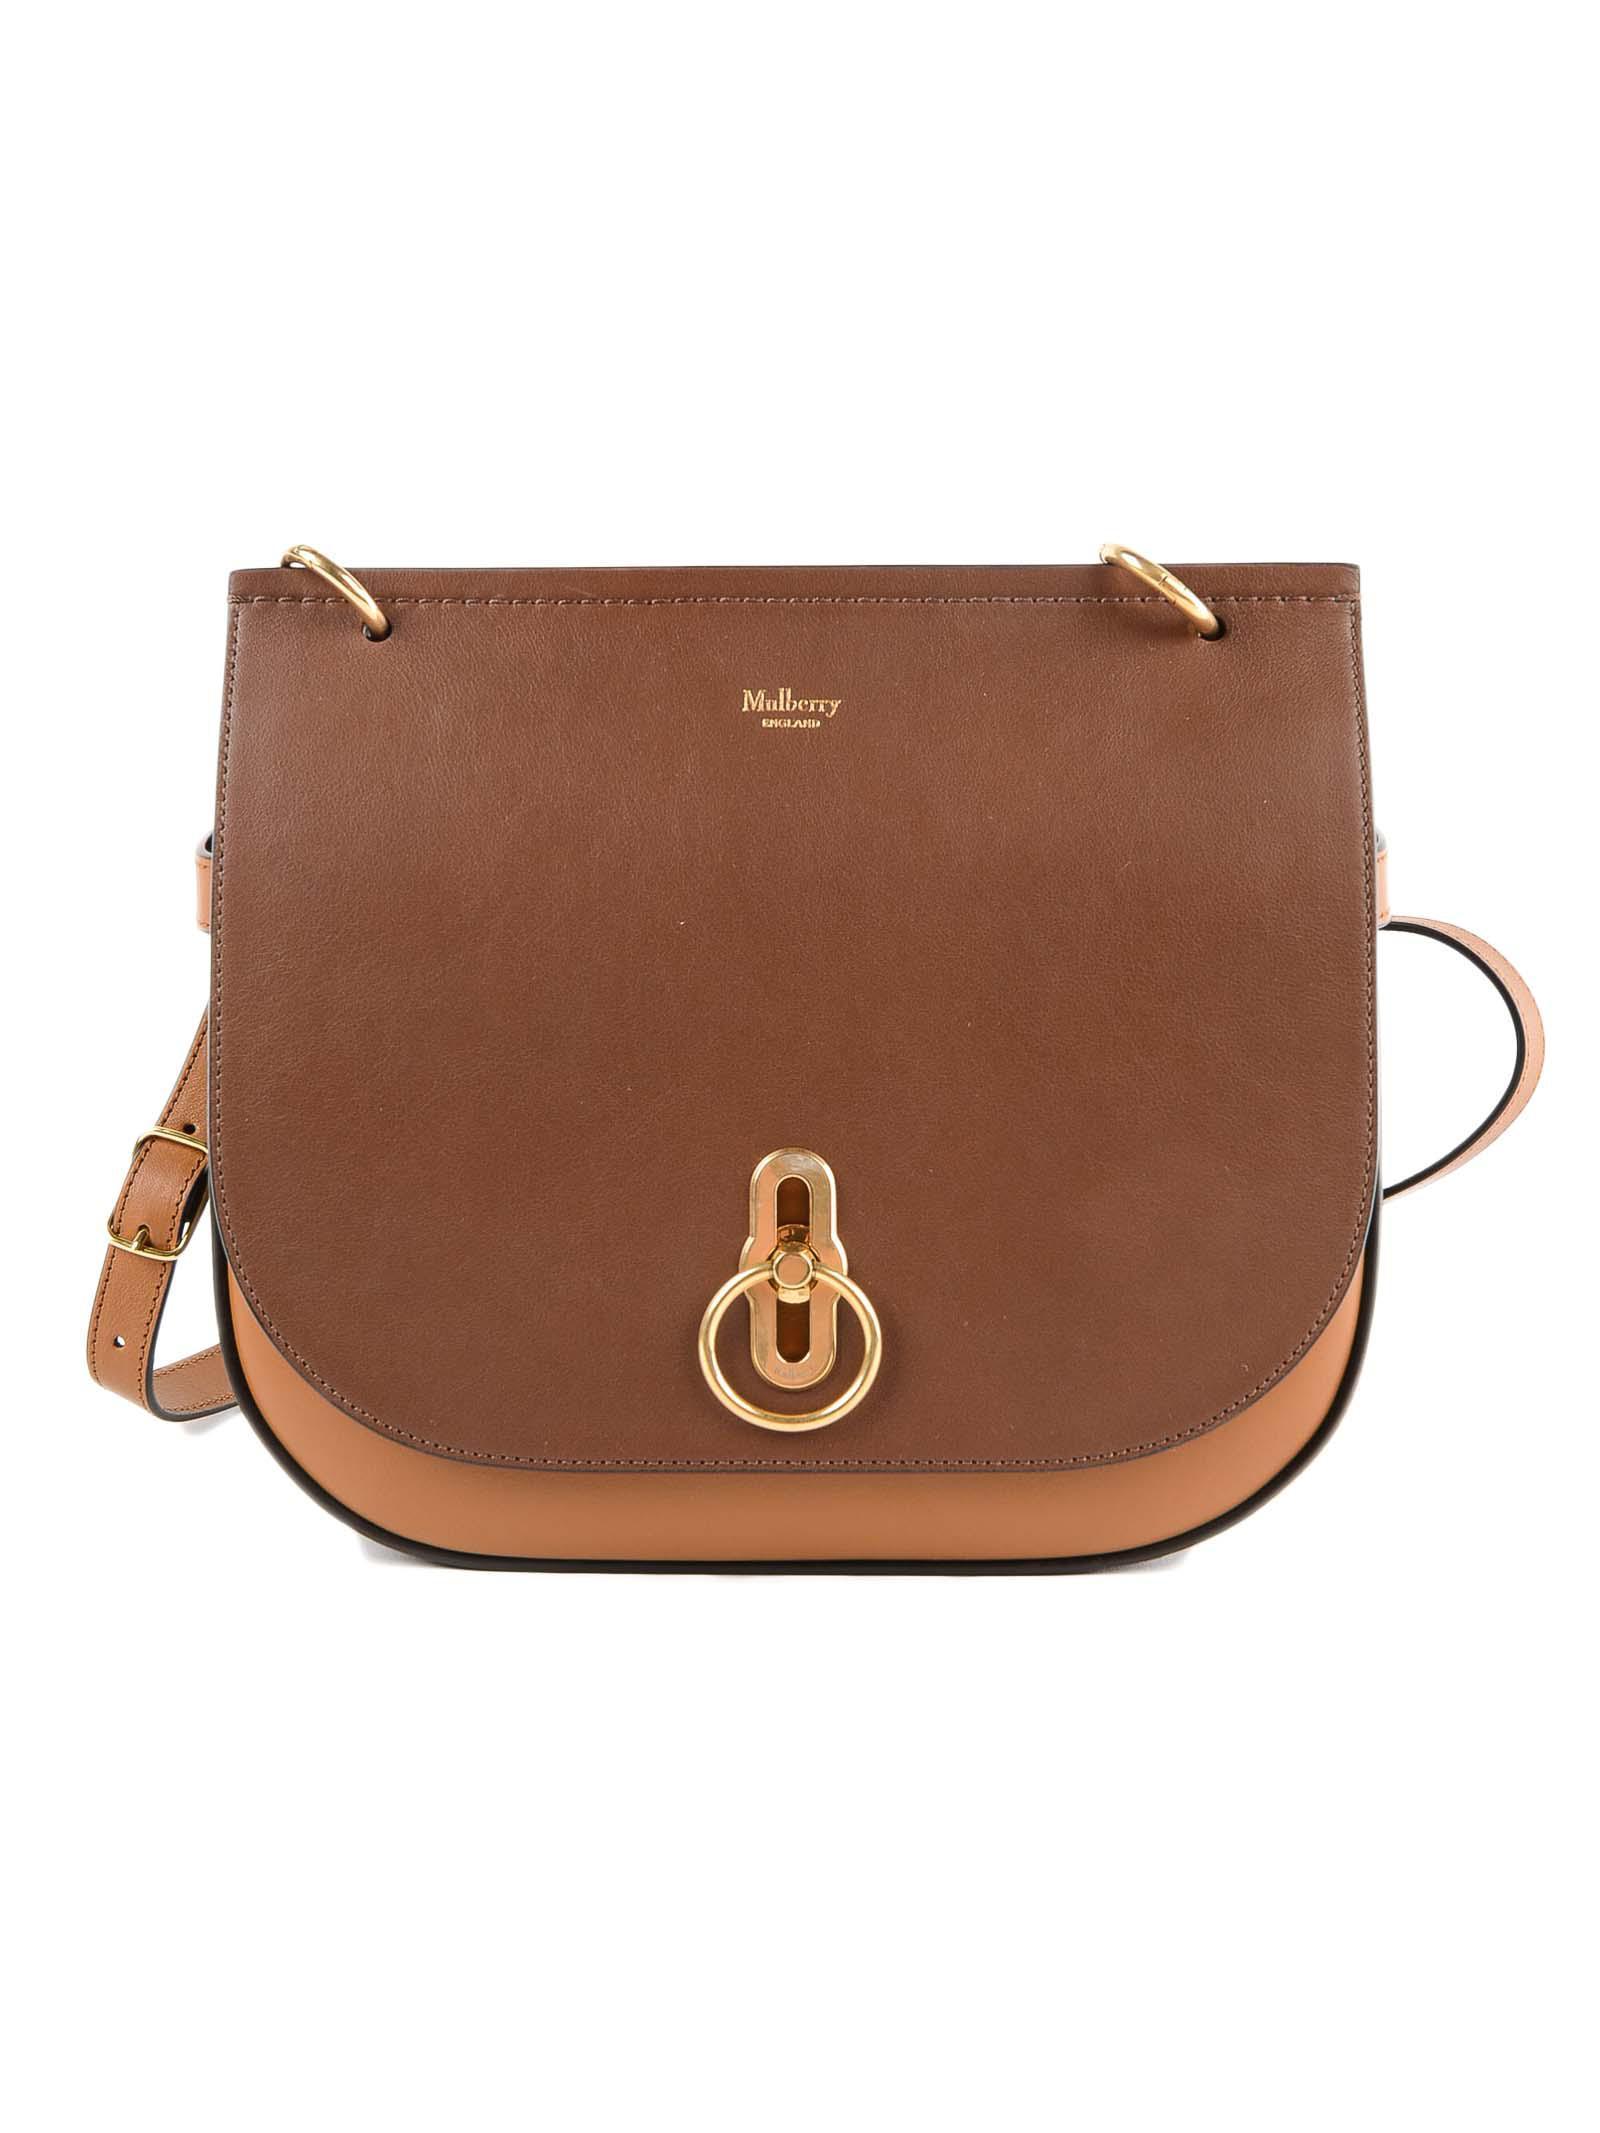 baccf8657cc8 Mulberry. Women s Amberley Bag